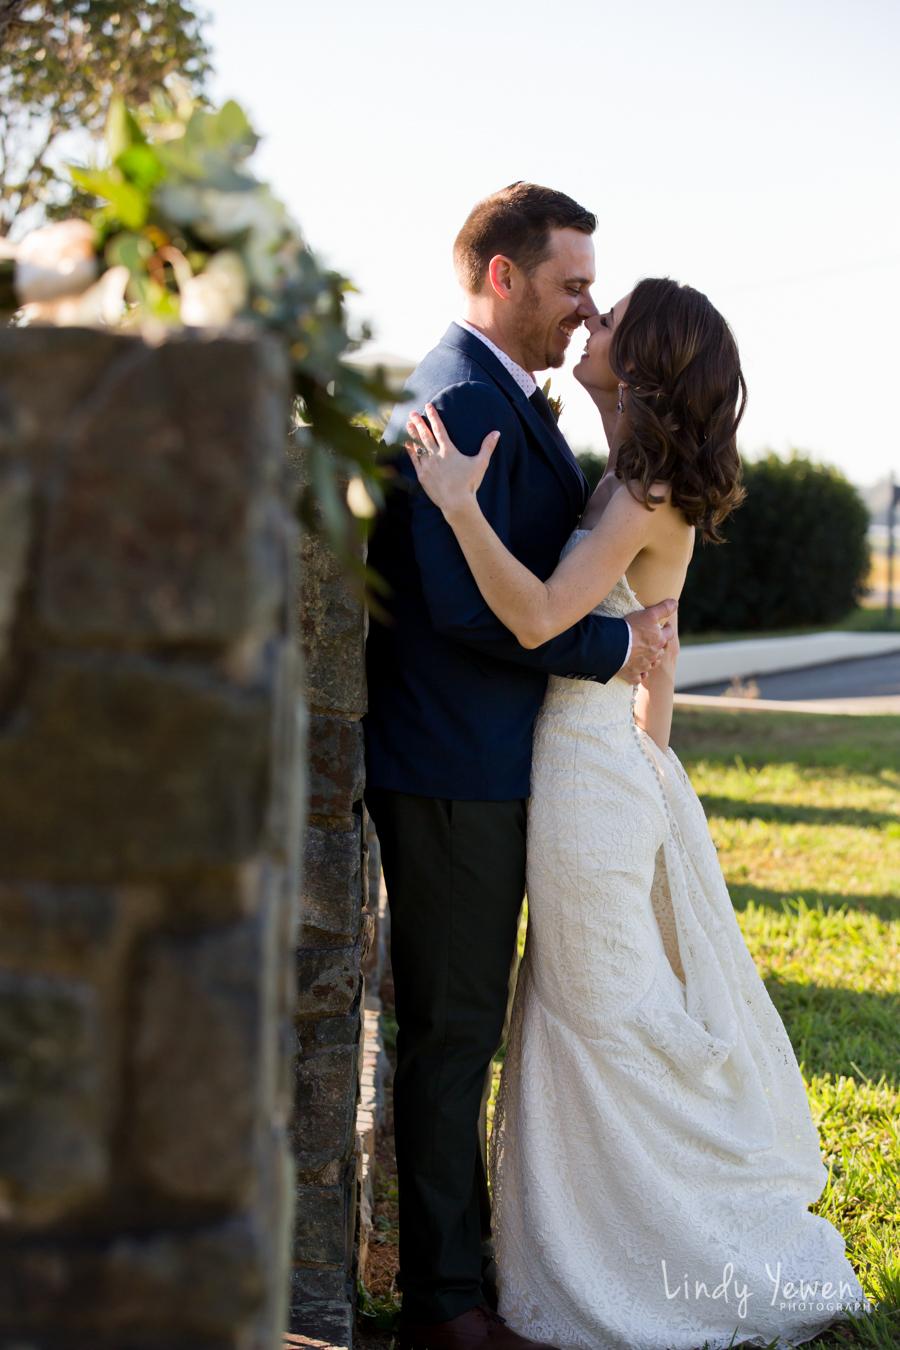 Montville-wedding-photographer-Lauren-Kirby 381.jpg